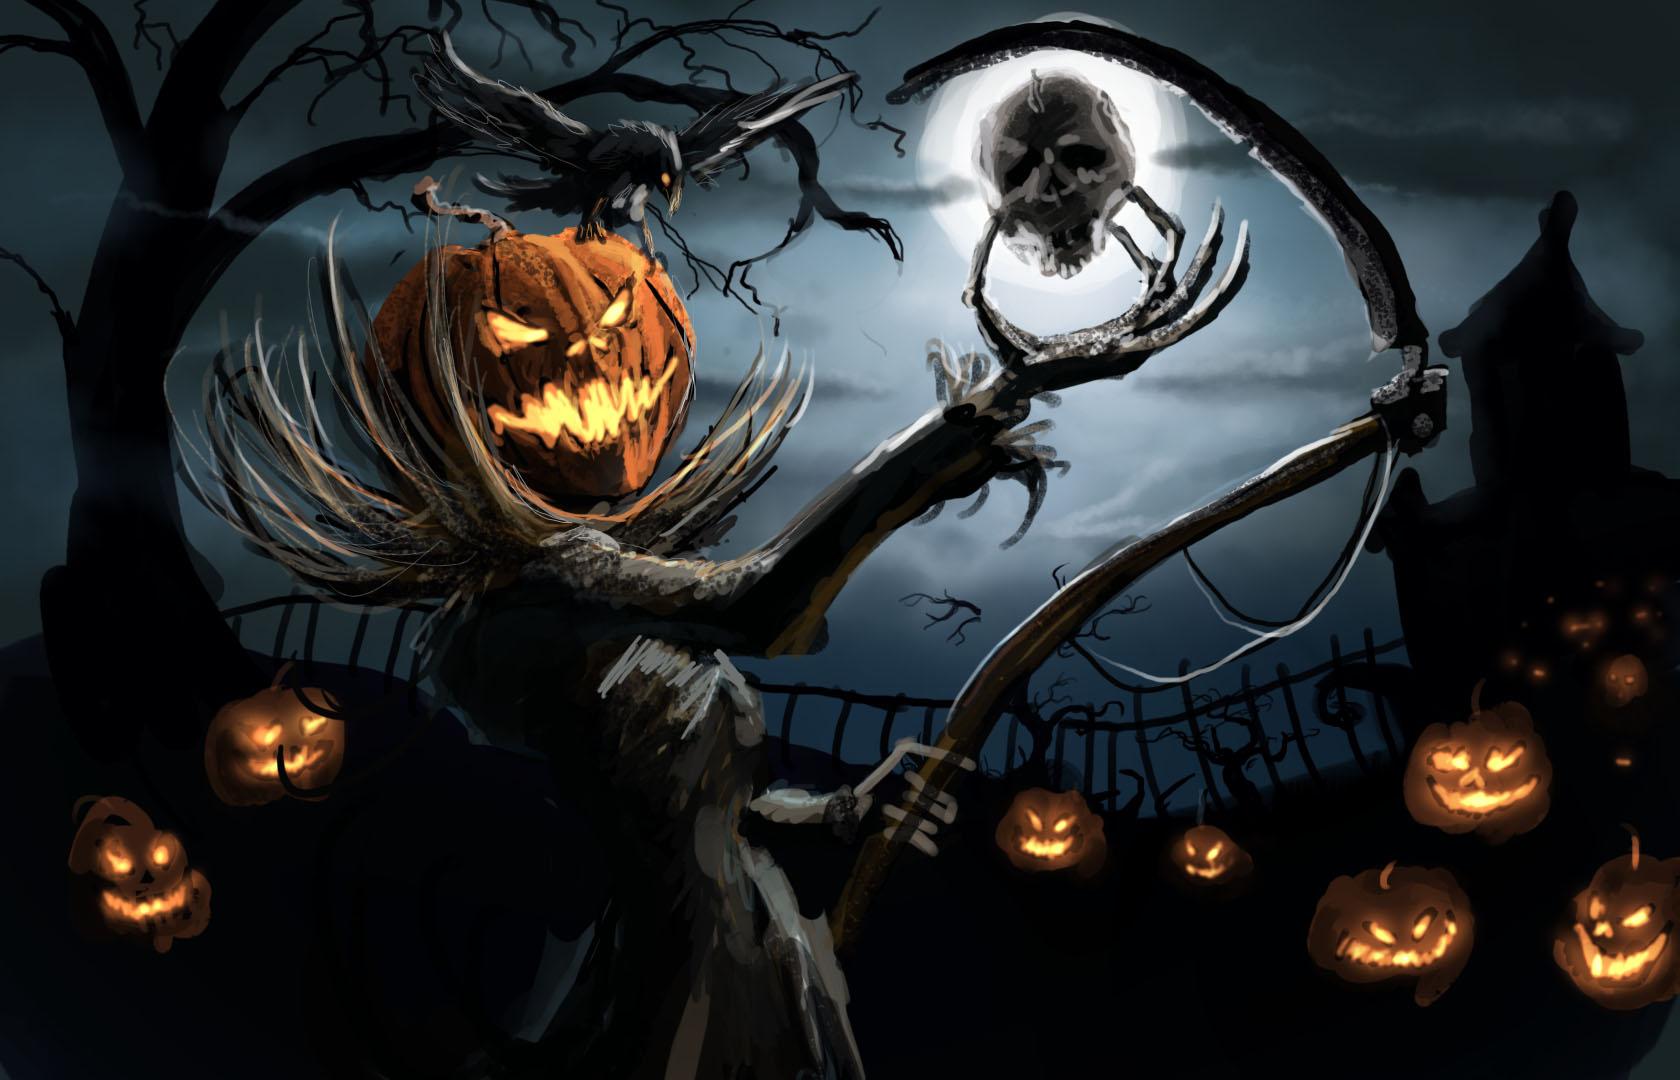 18 Image for Desktop: Creepy Halloween